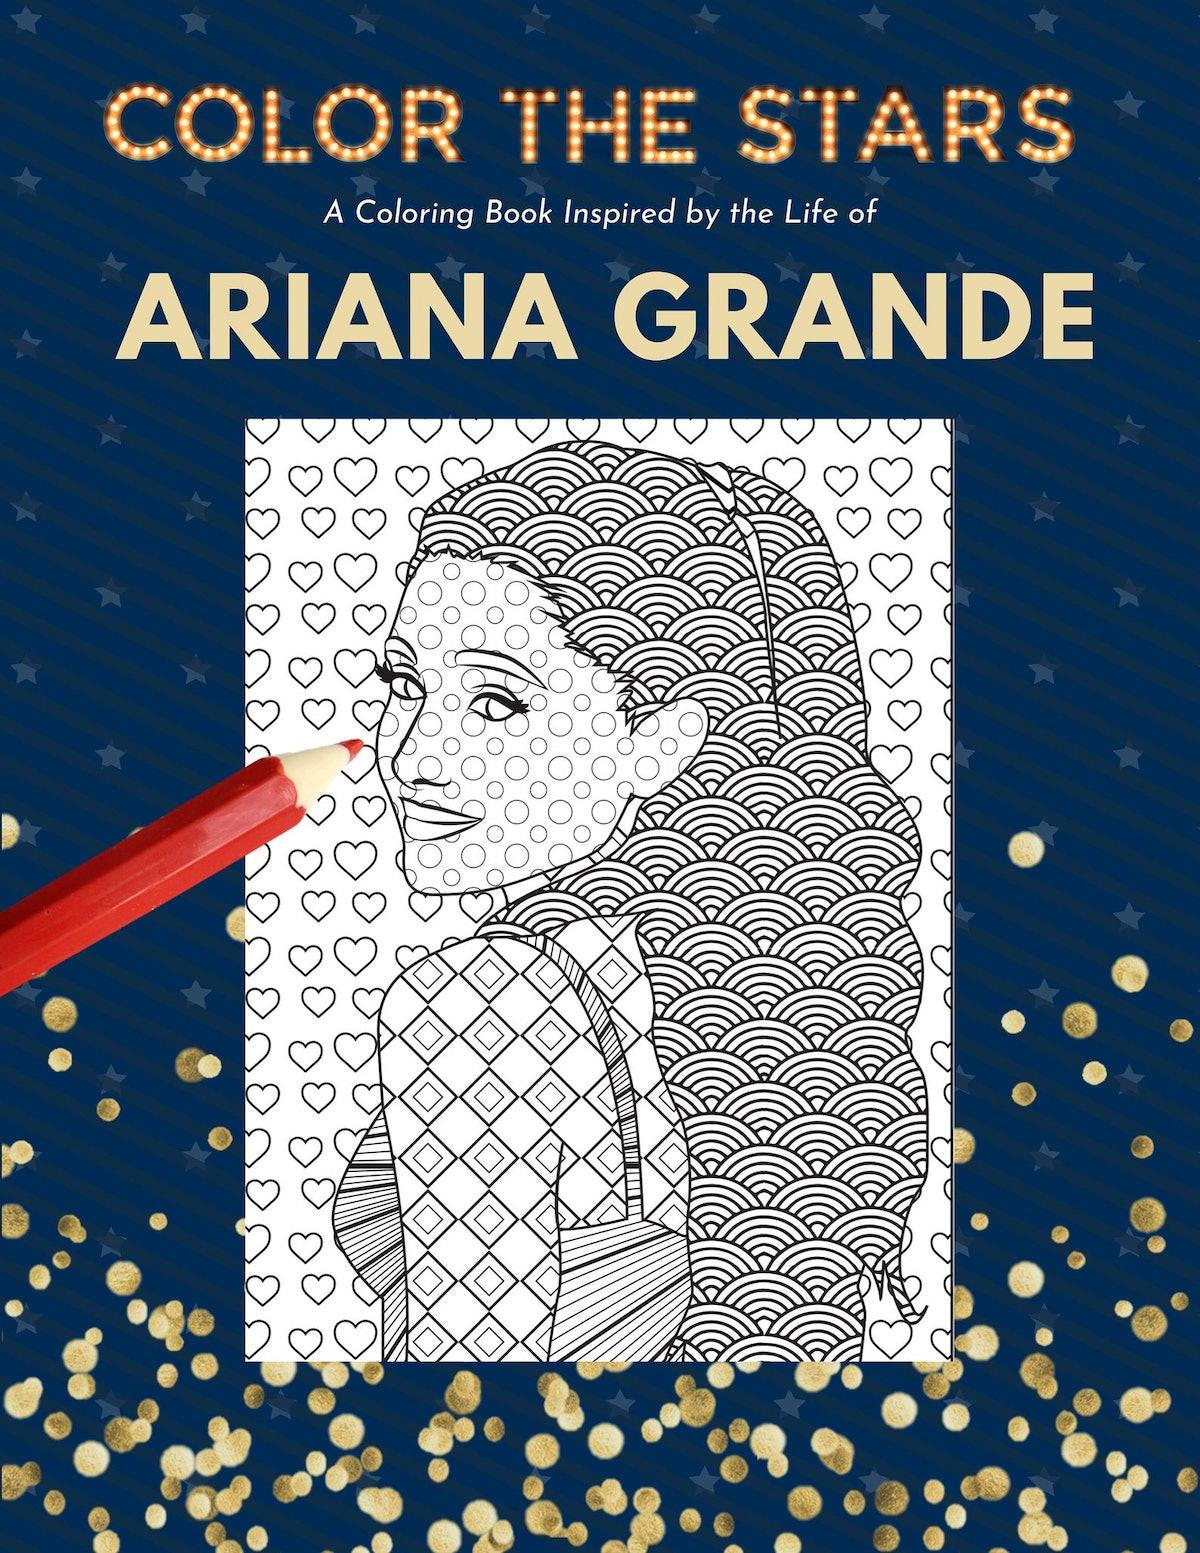 ColorTheStarsCo - Ariana Grande Inspired Coloring Book